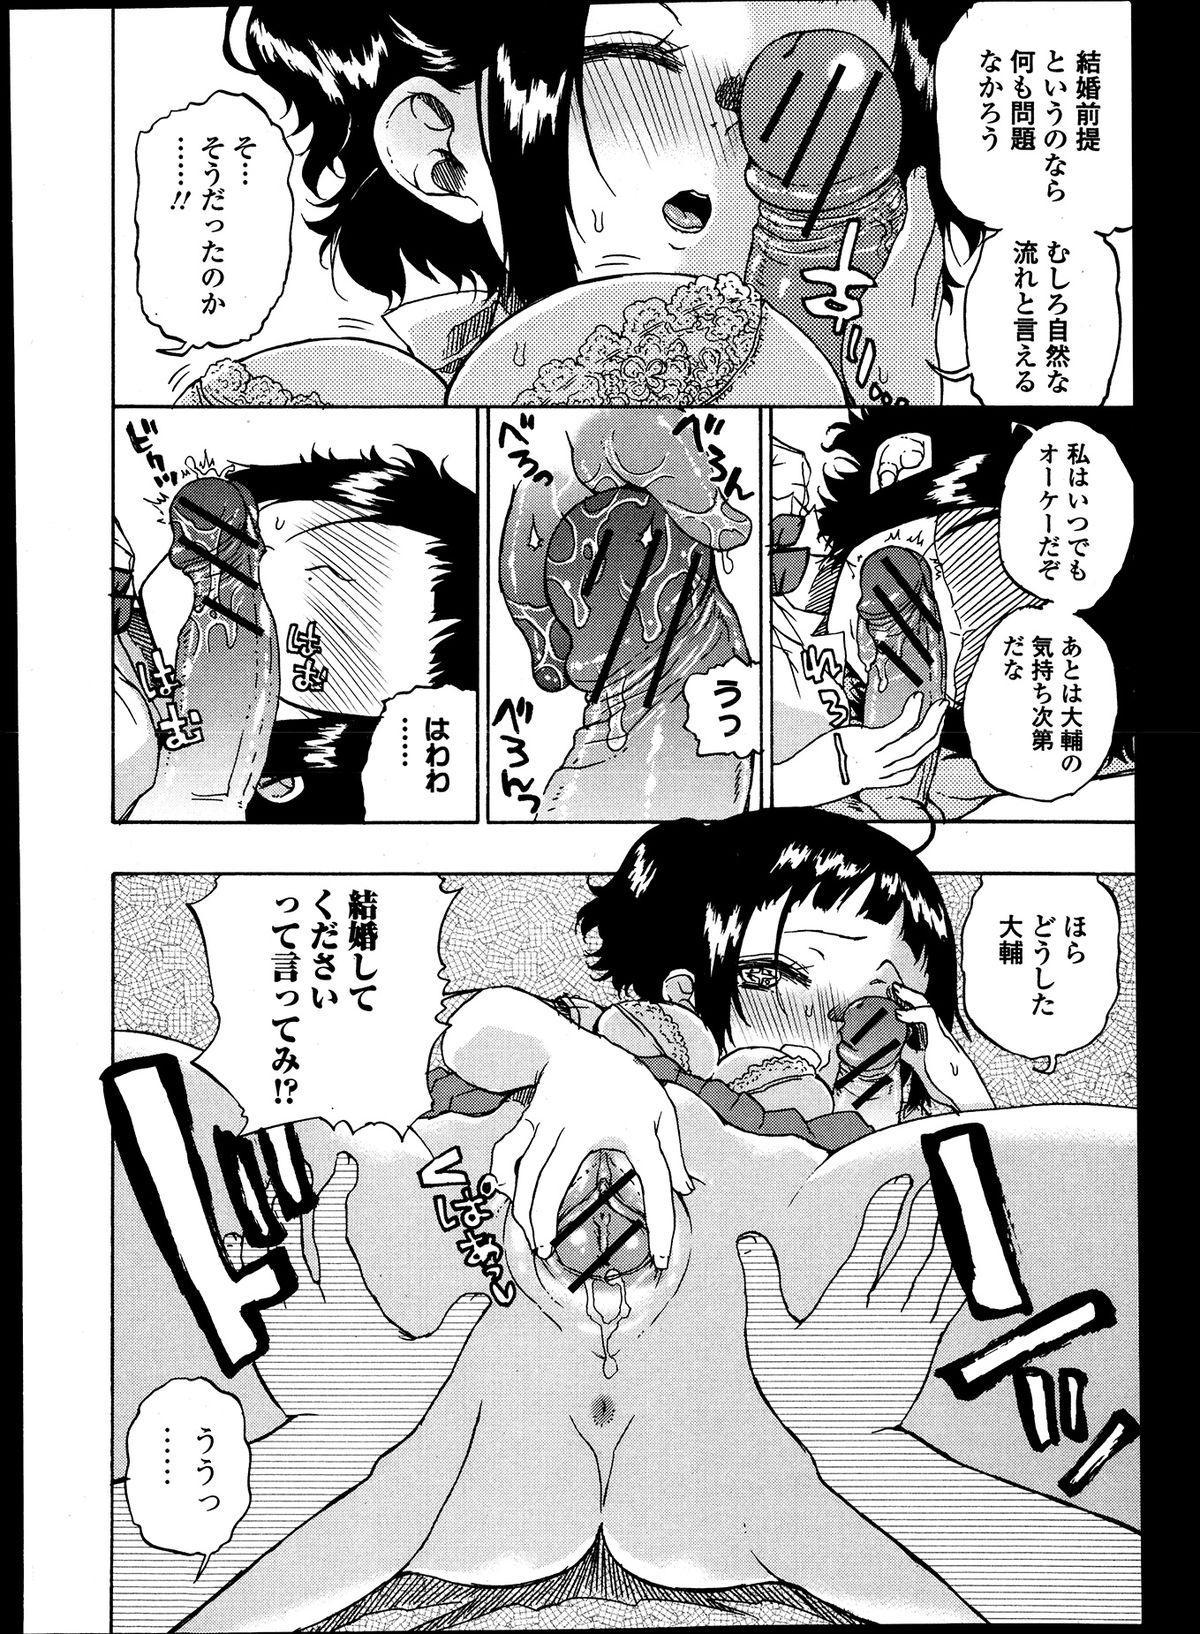 Bishoujo Kakumei KIWAME Road Vol.9 145